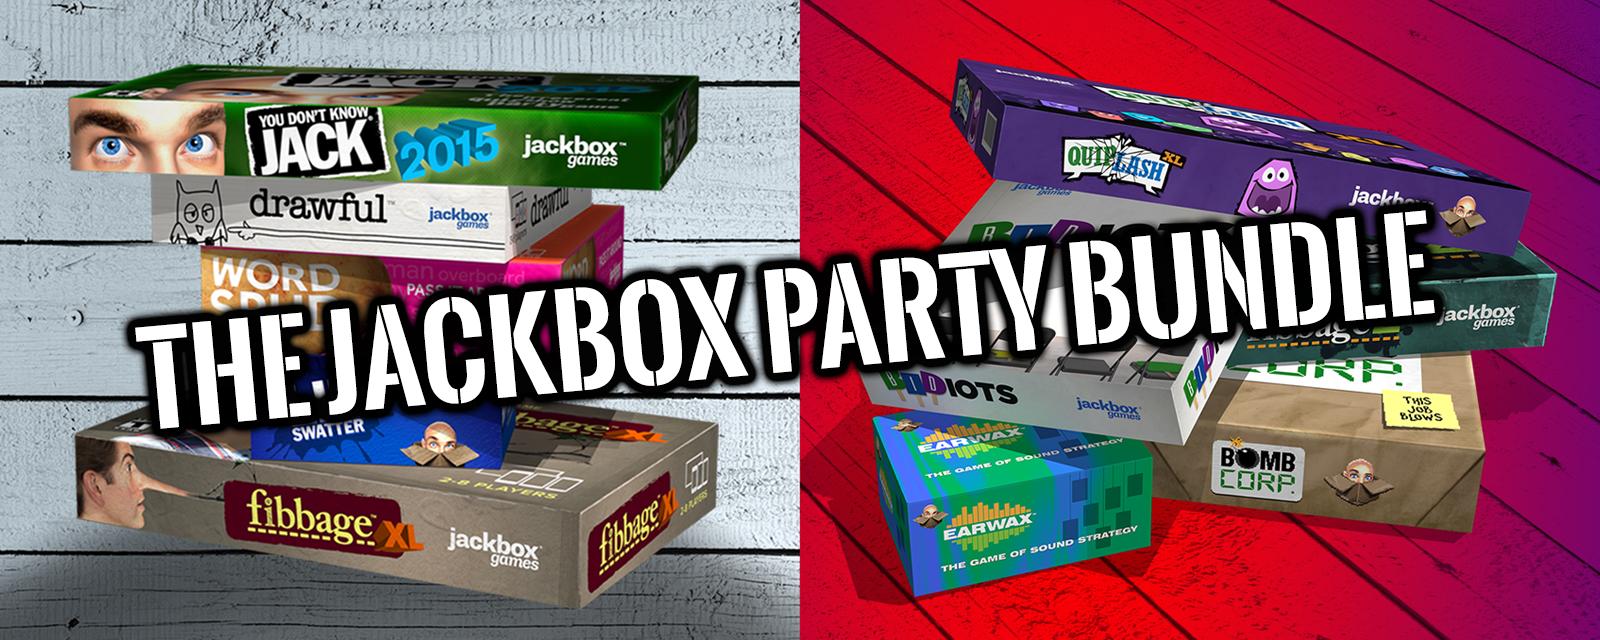 The Jackbox Party Bundle